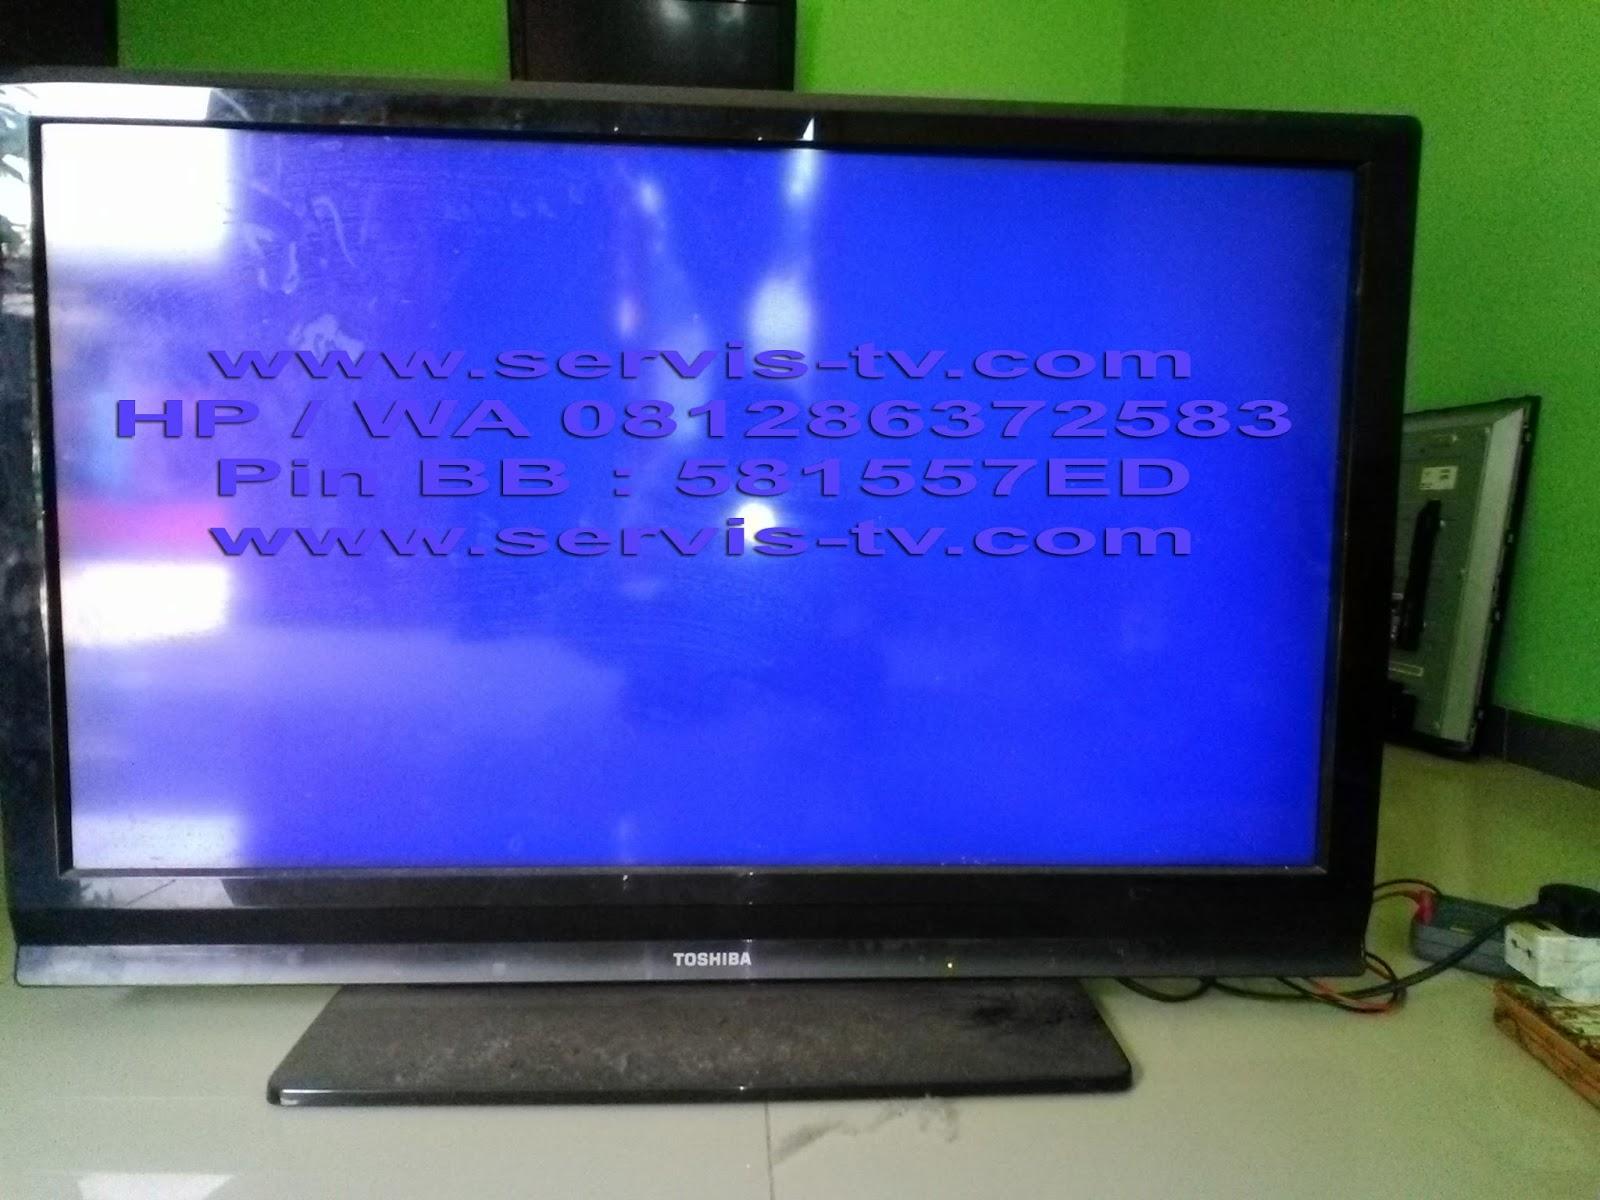 Pusat Layanan Service LCD LED TV Tangerang